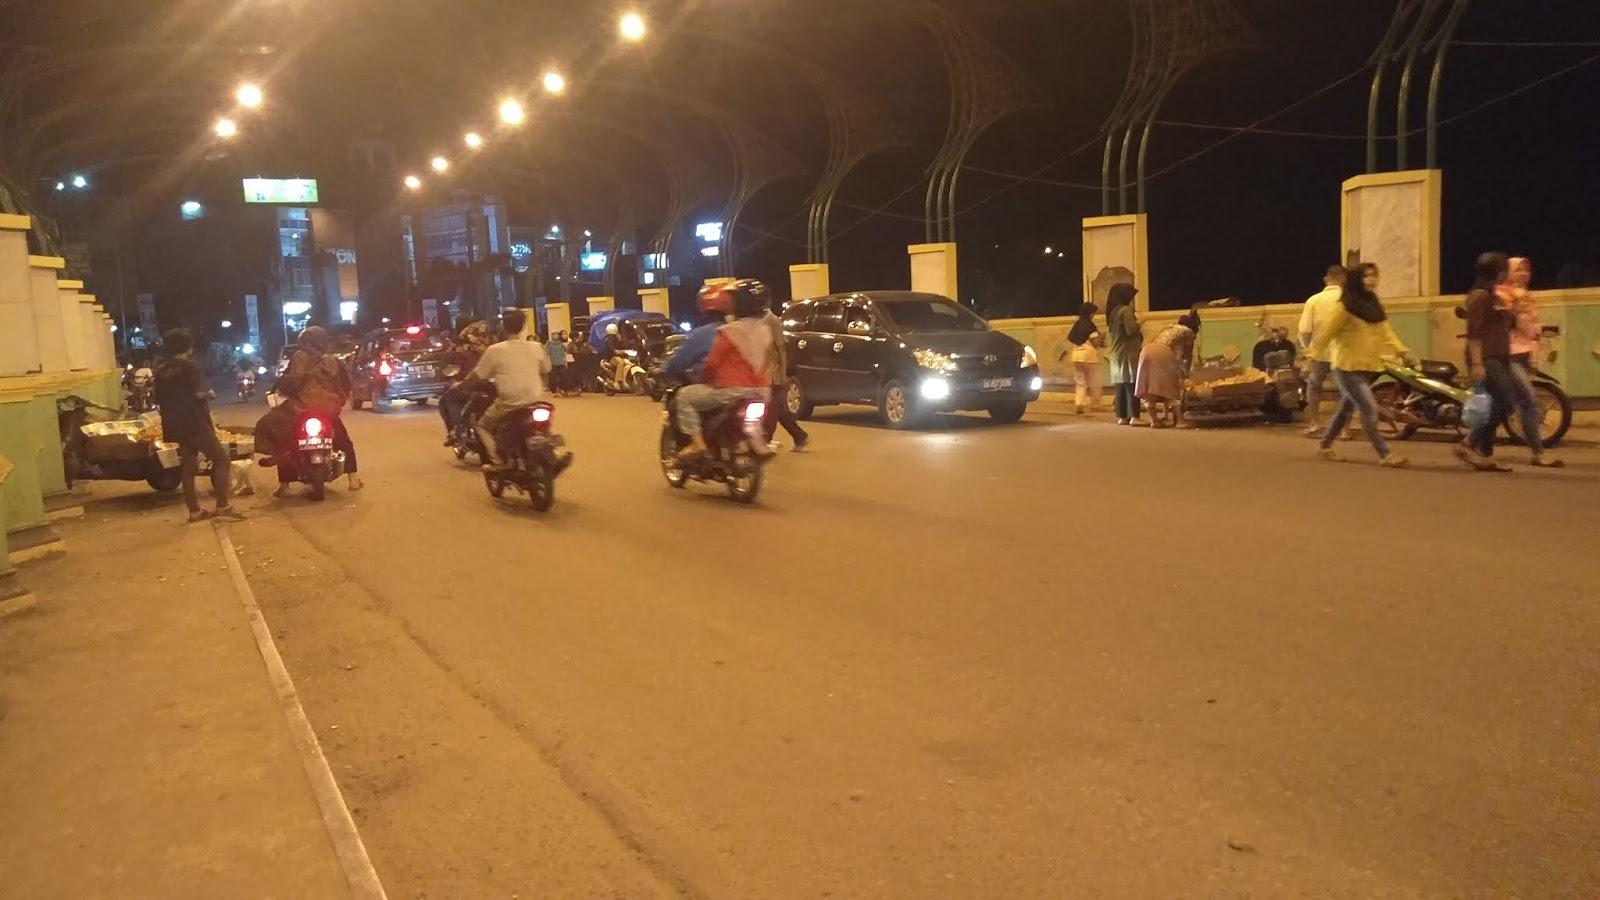 Alih Fungsi Jembatan Siborang Kota Padangsidimpuan Dijadikan Lahan Berdagang